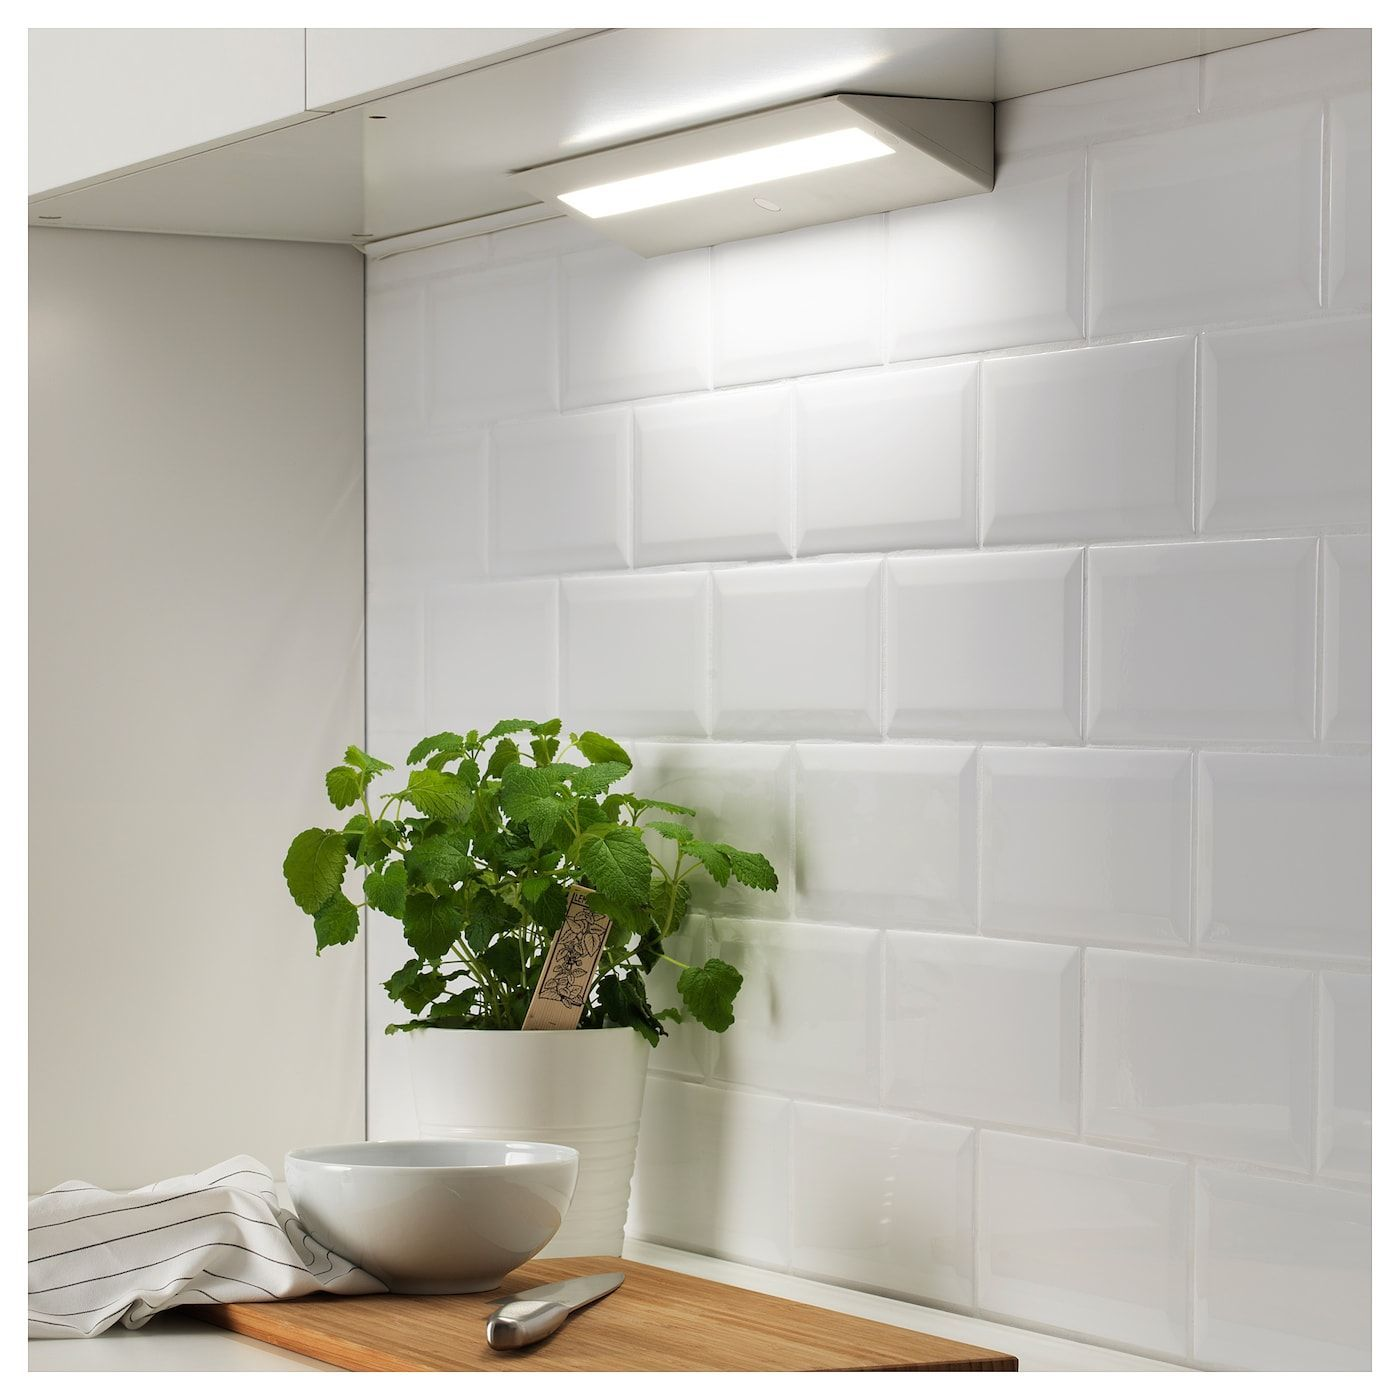 Slagsida Led Countertop Light White Ikea In 2020 Kitchen Remodel Countertops Worktop Lighting